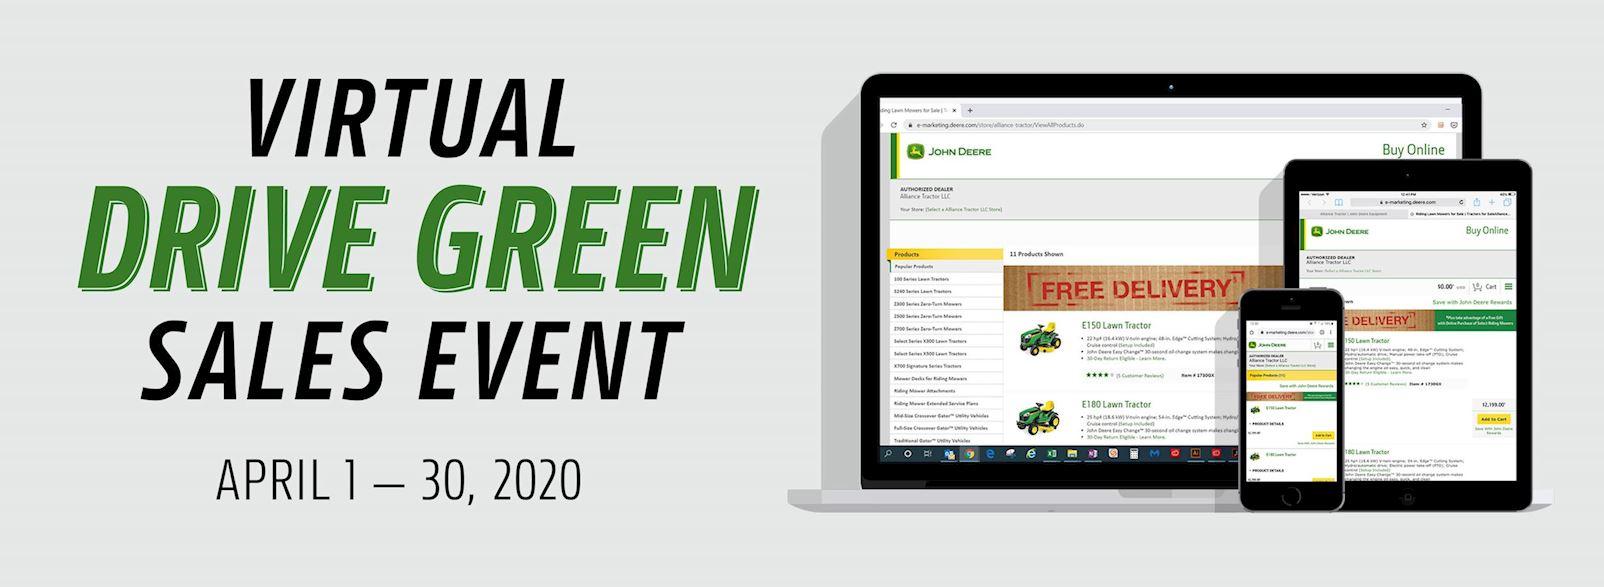 2020 Virtual Drive Green Event